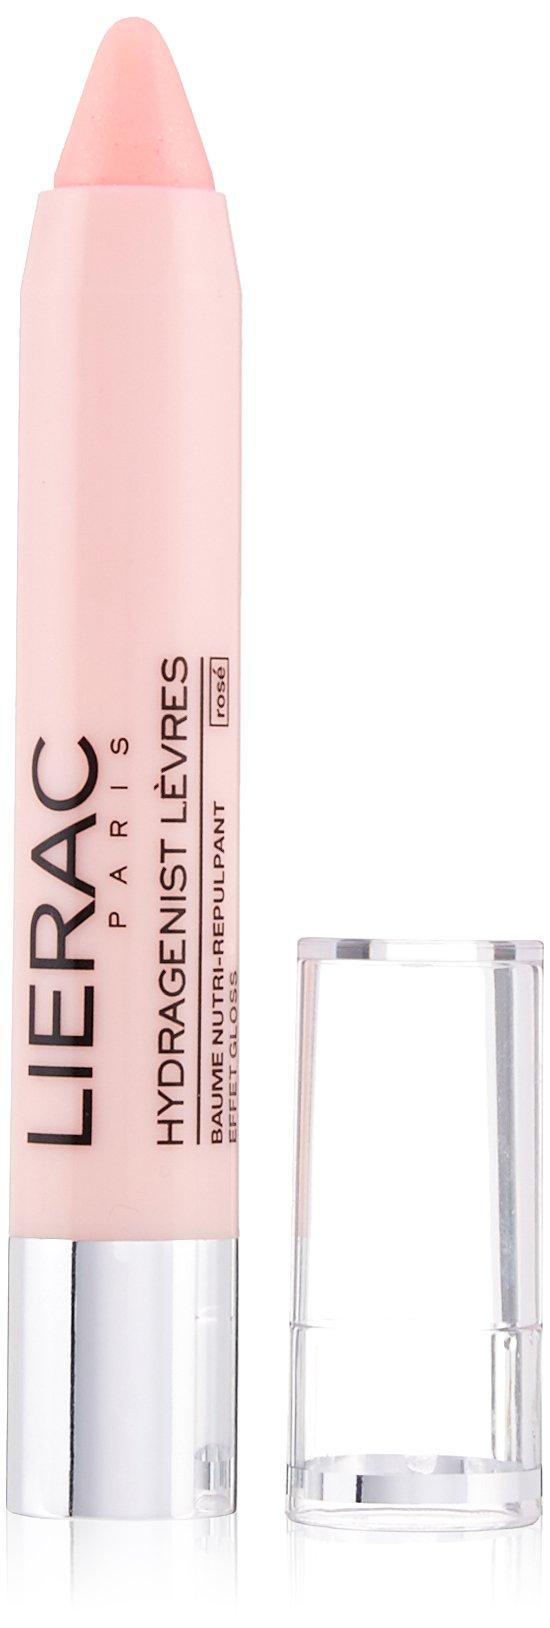 LIERAC Hydragenist Lip Balm with Pink Gloss Effect, Rose Vanilla, 0.1 oz.